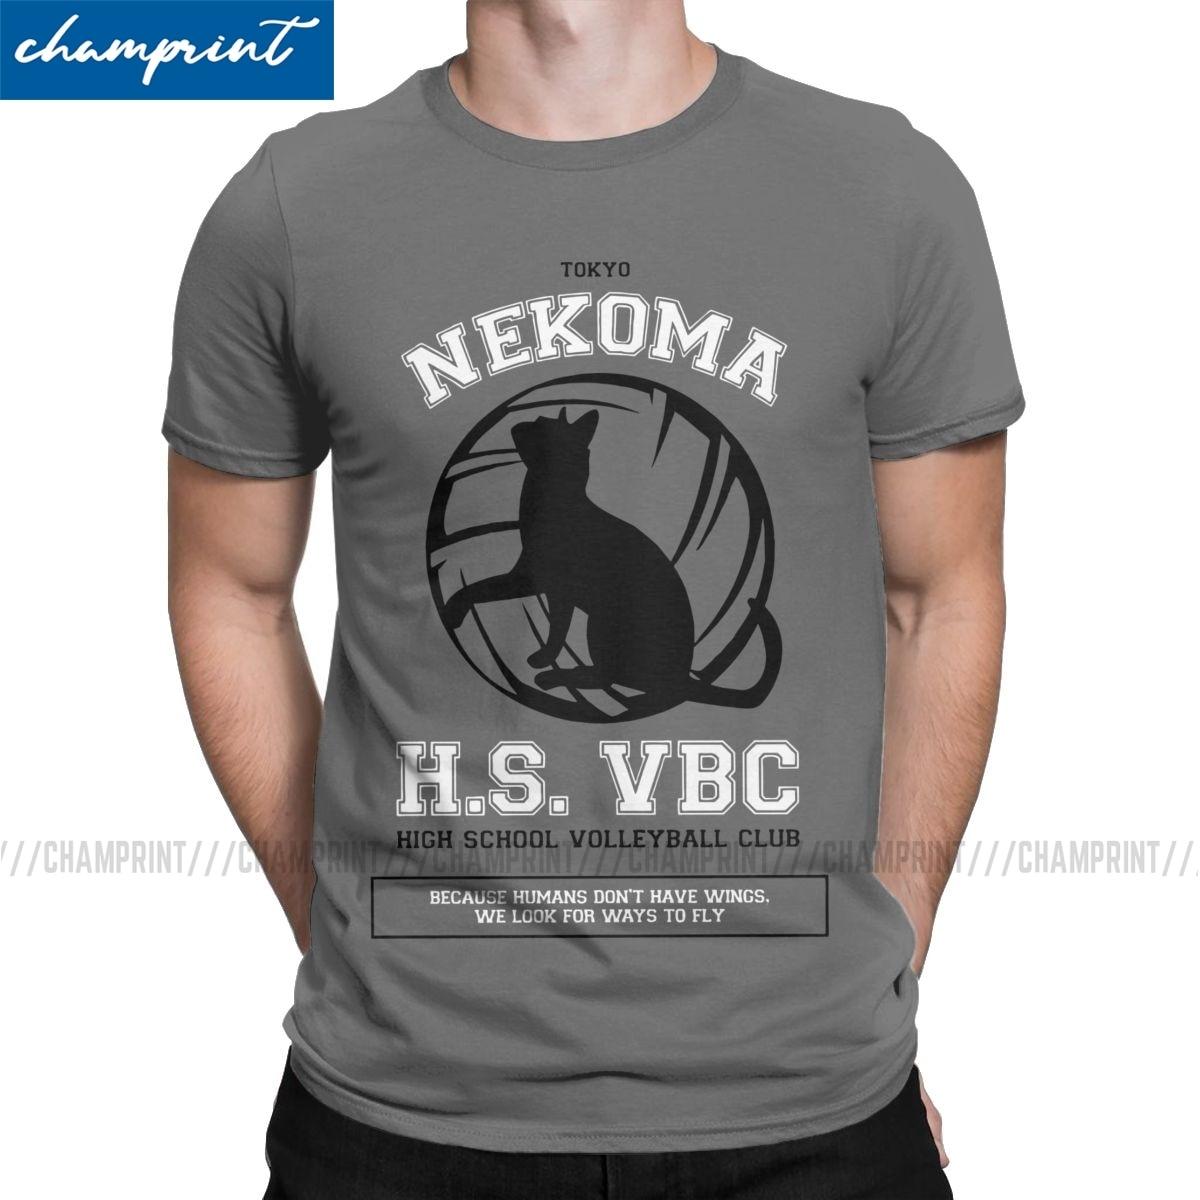 2019 Fashion Nekoma HS VBC Team T-Shirts Men T Shirts Haikyuu Anime Volleyball Manga Short Sleeve Tees Graphic Printed Clothes